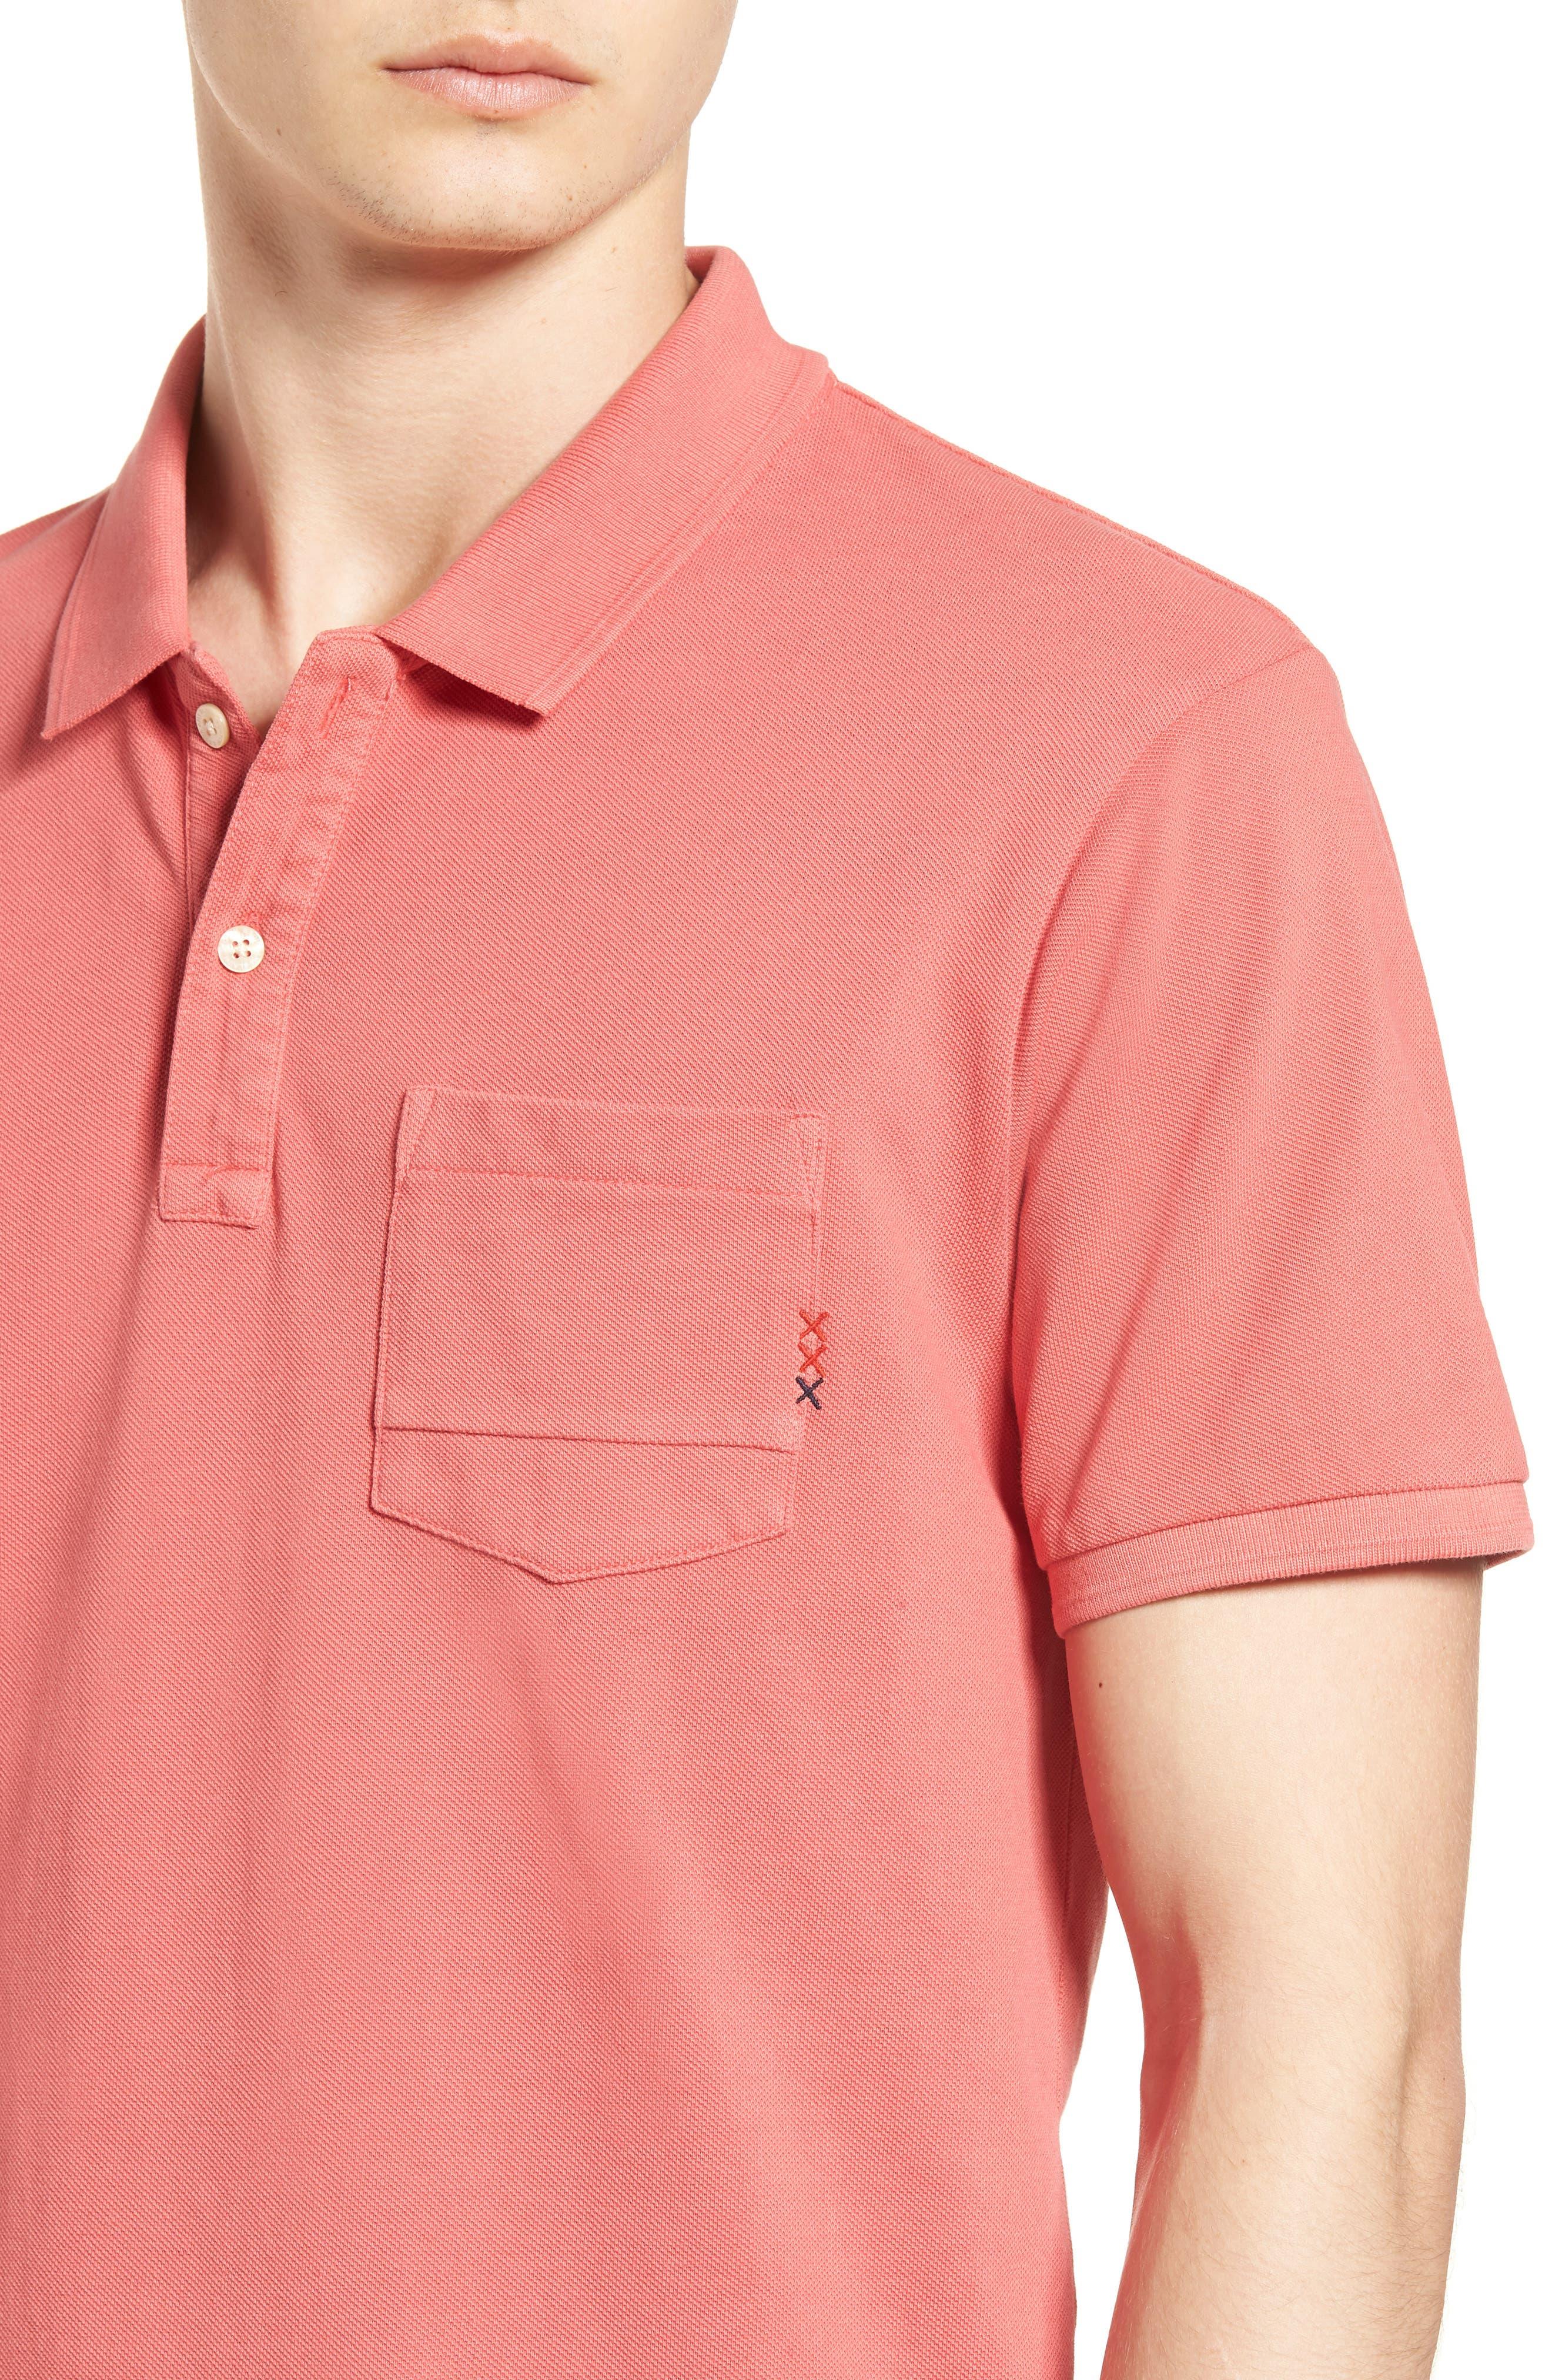 Garment Dyed Polo,                             Alternate thumbnail 4, color,                             600